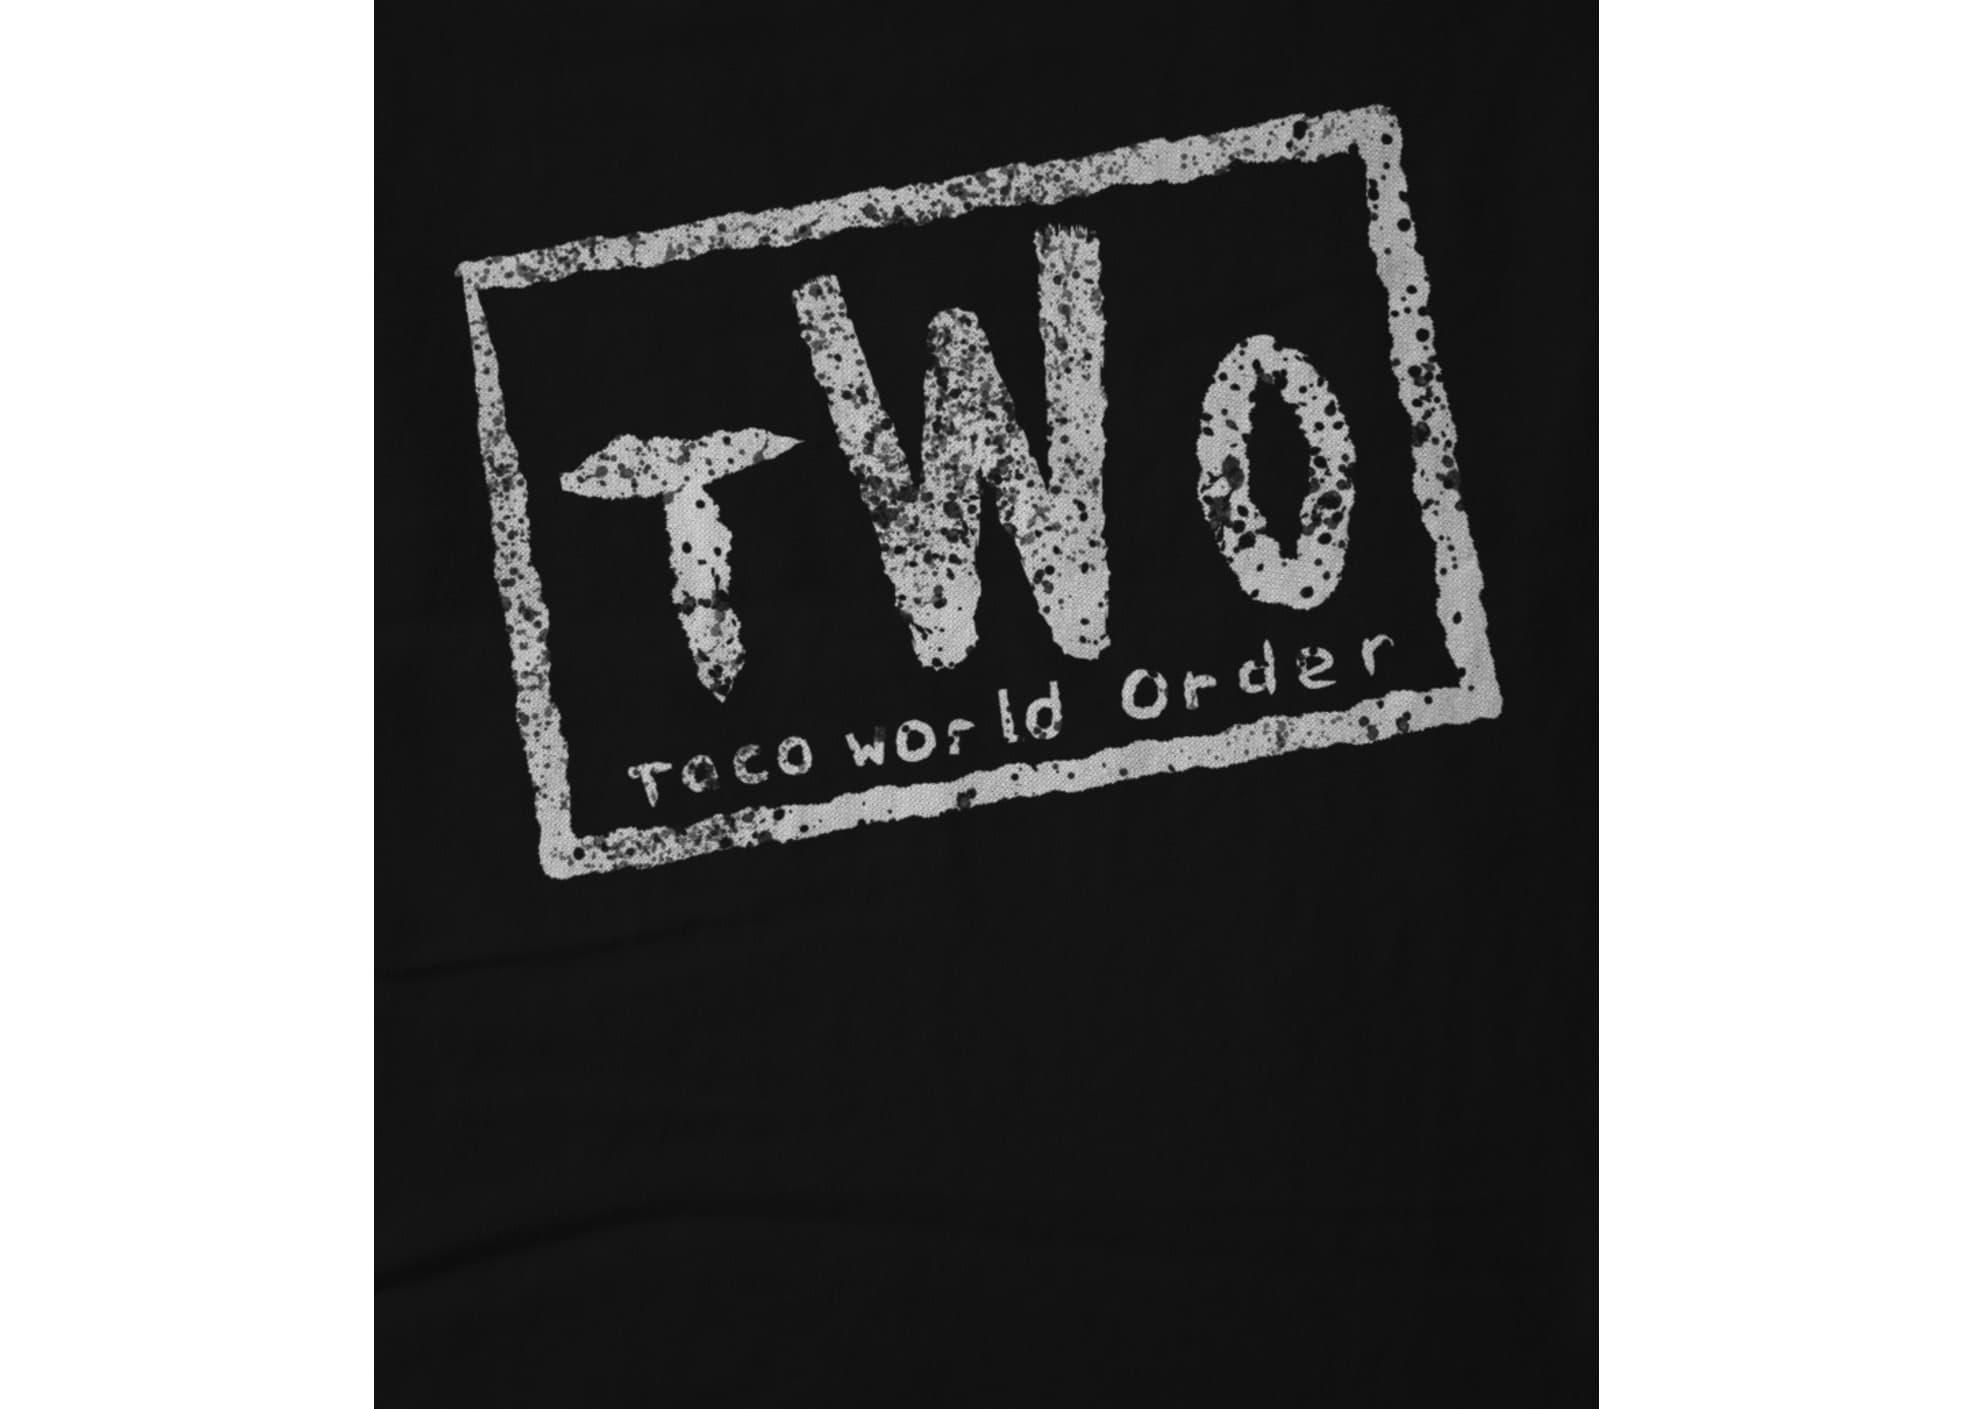 Tacostabber taco world order 1616391053